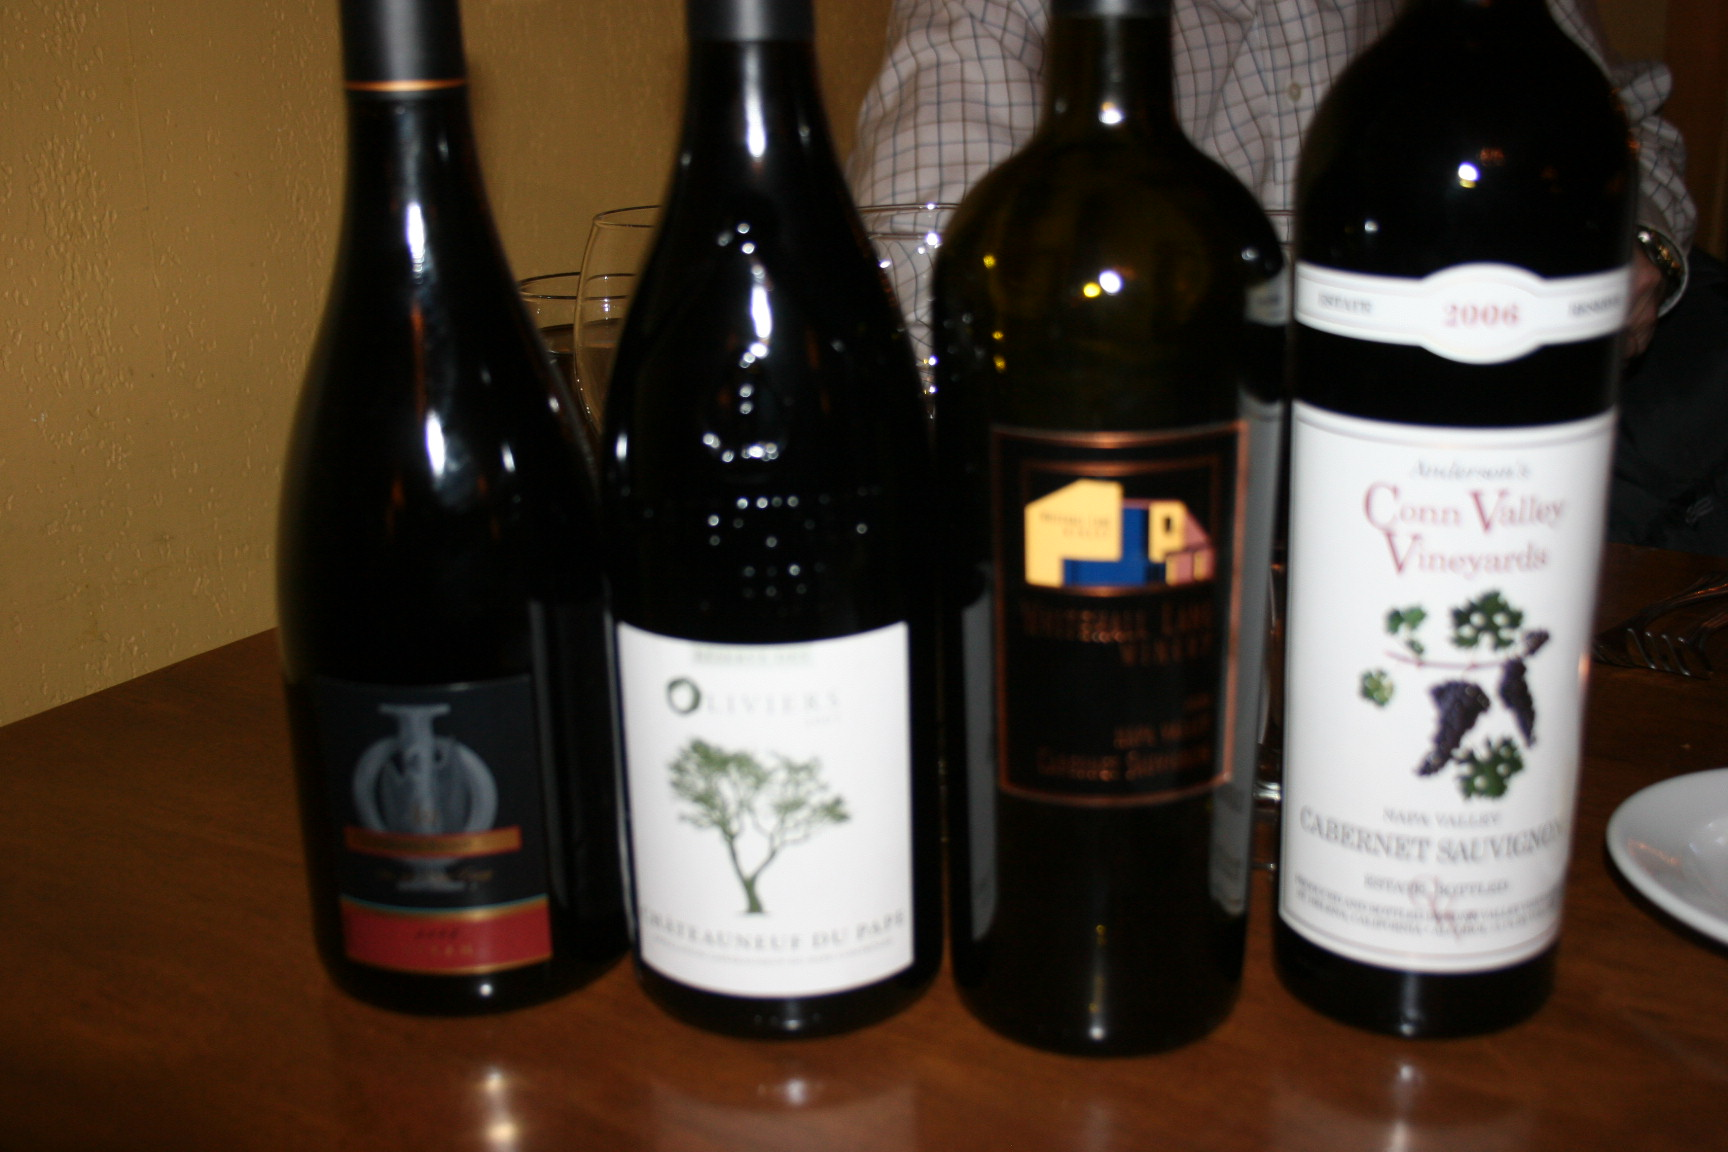 Main Line | South Jersey Wine & Dine